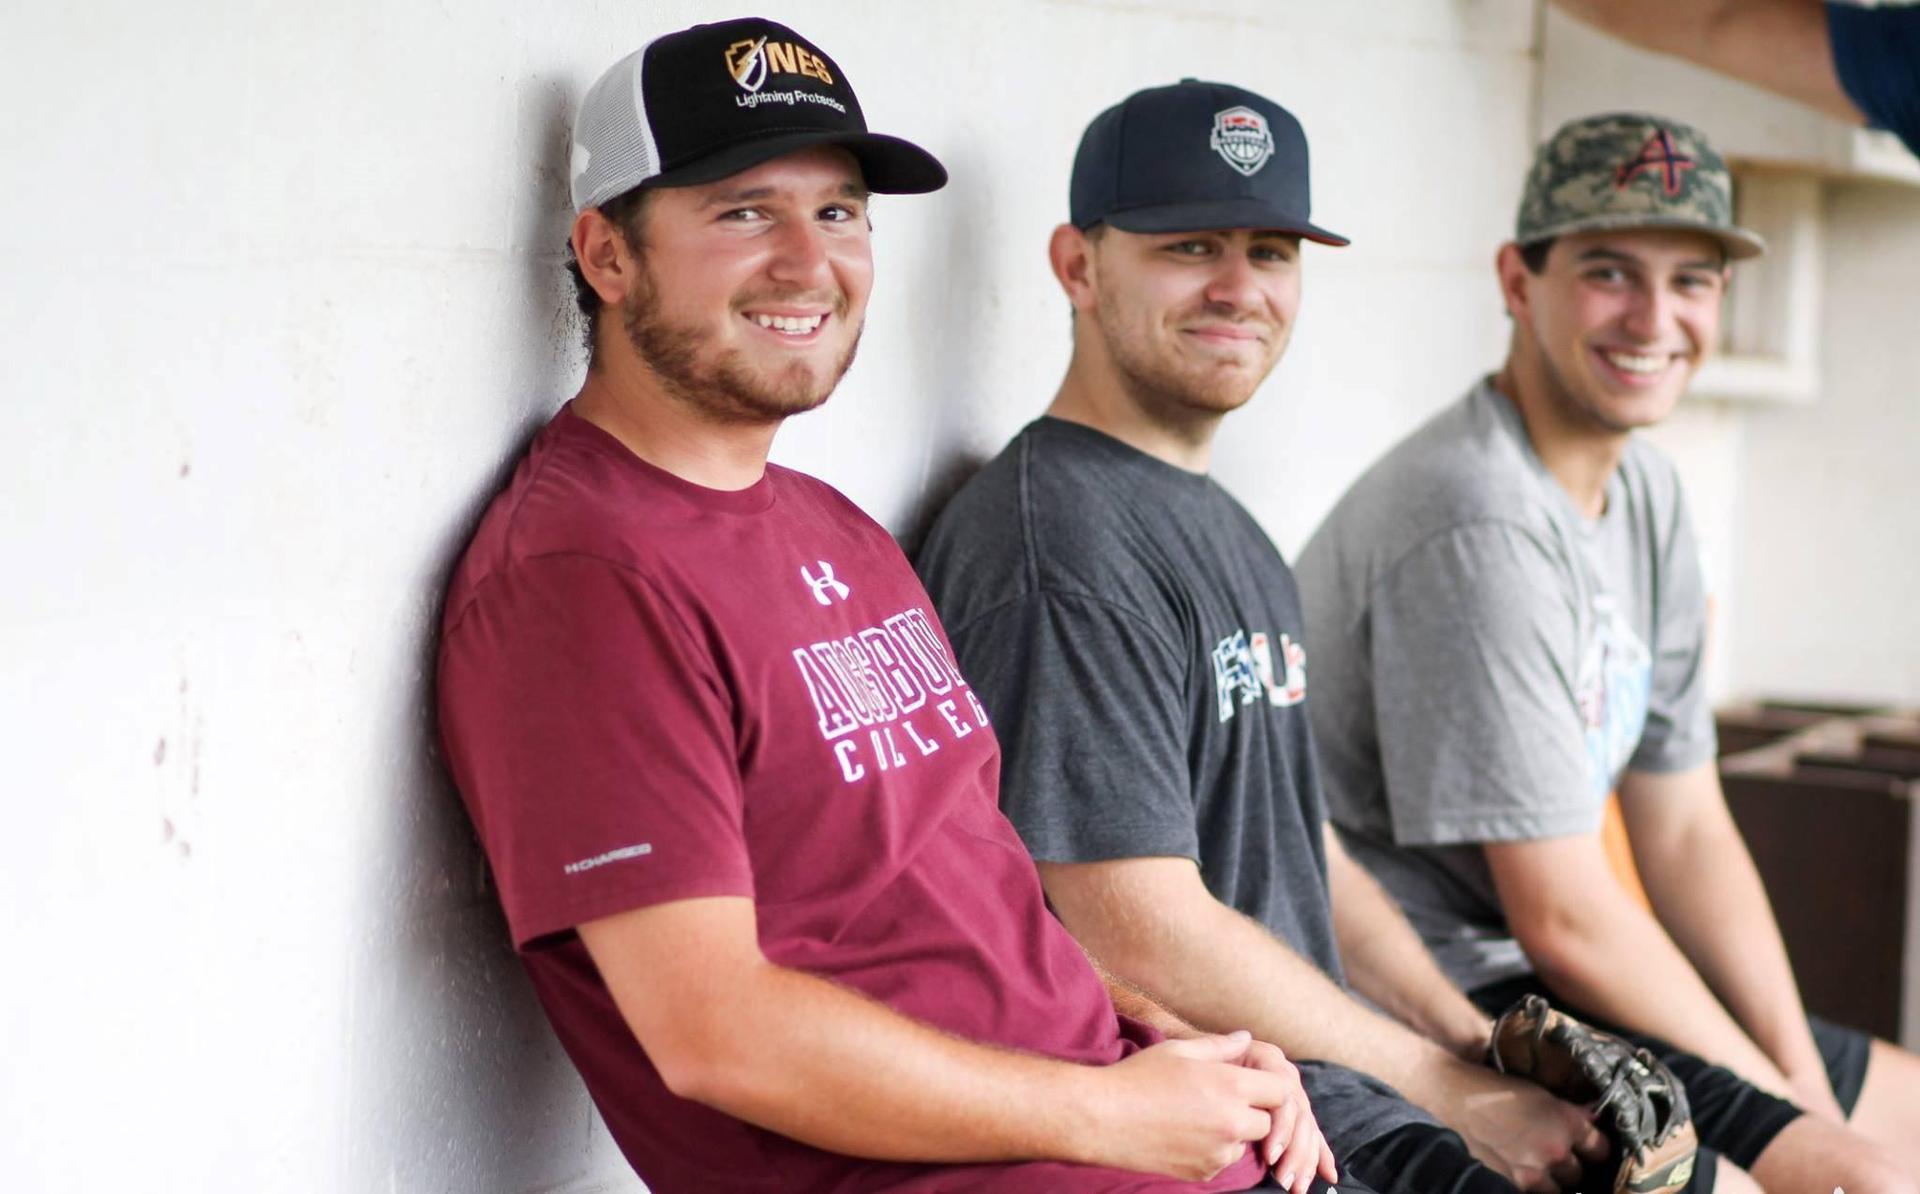 Three alumni smile at camera